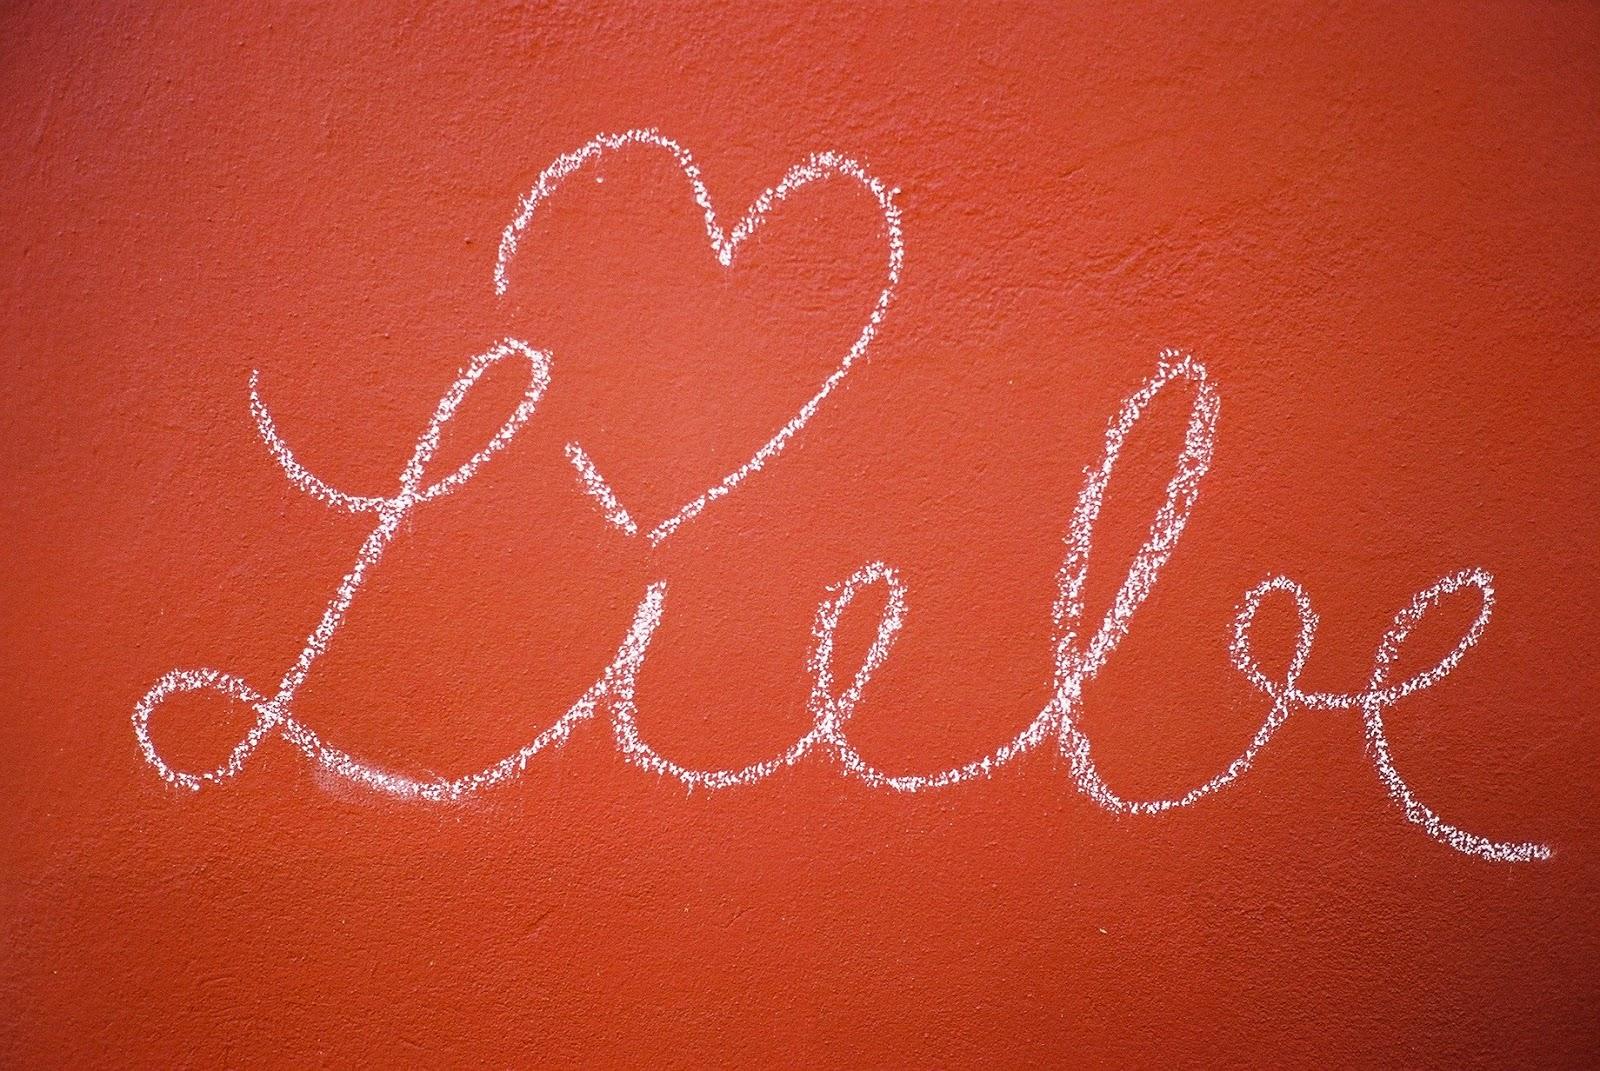 LOVE, SYMBOLS OF LOVE, LIEBE, BERLIN, GERMANY, GRAFFITI, STREET ART, DECLARATIONS OF LOVE, © VAC 100 DAYS 4 MILLION CONVERSATIONS